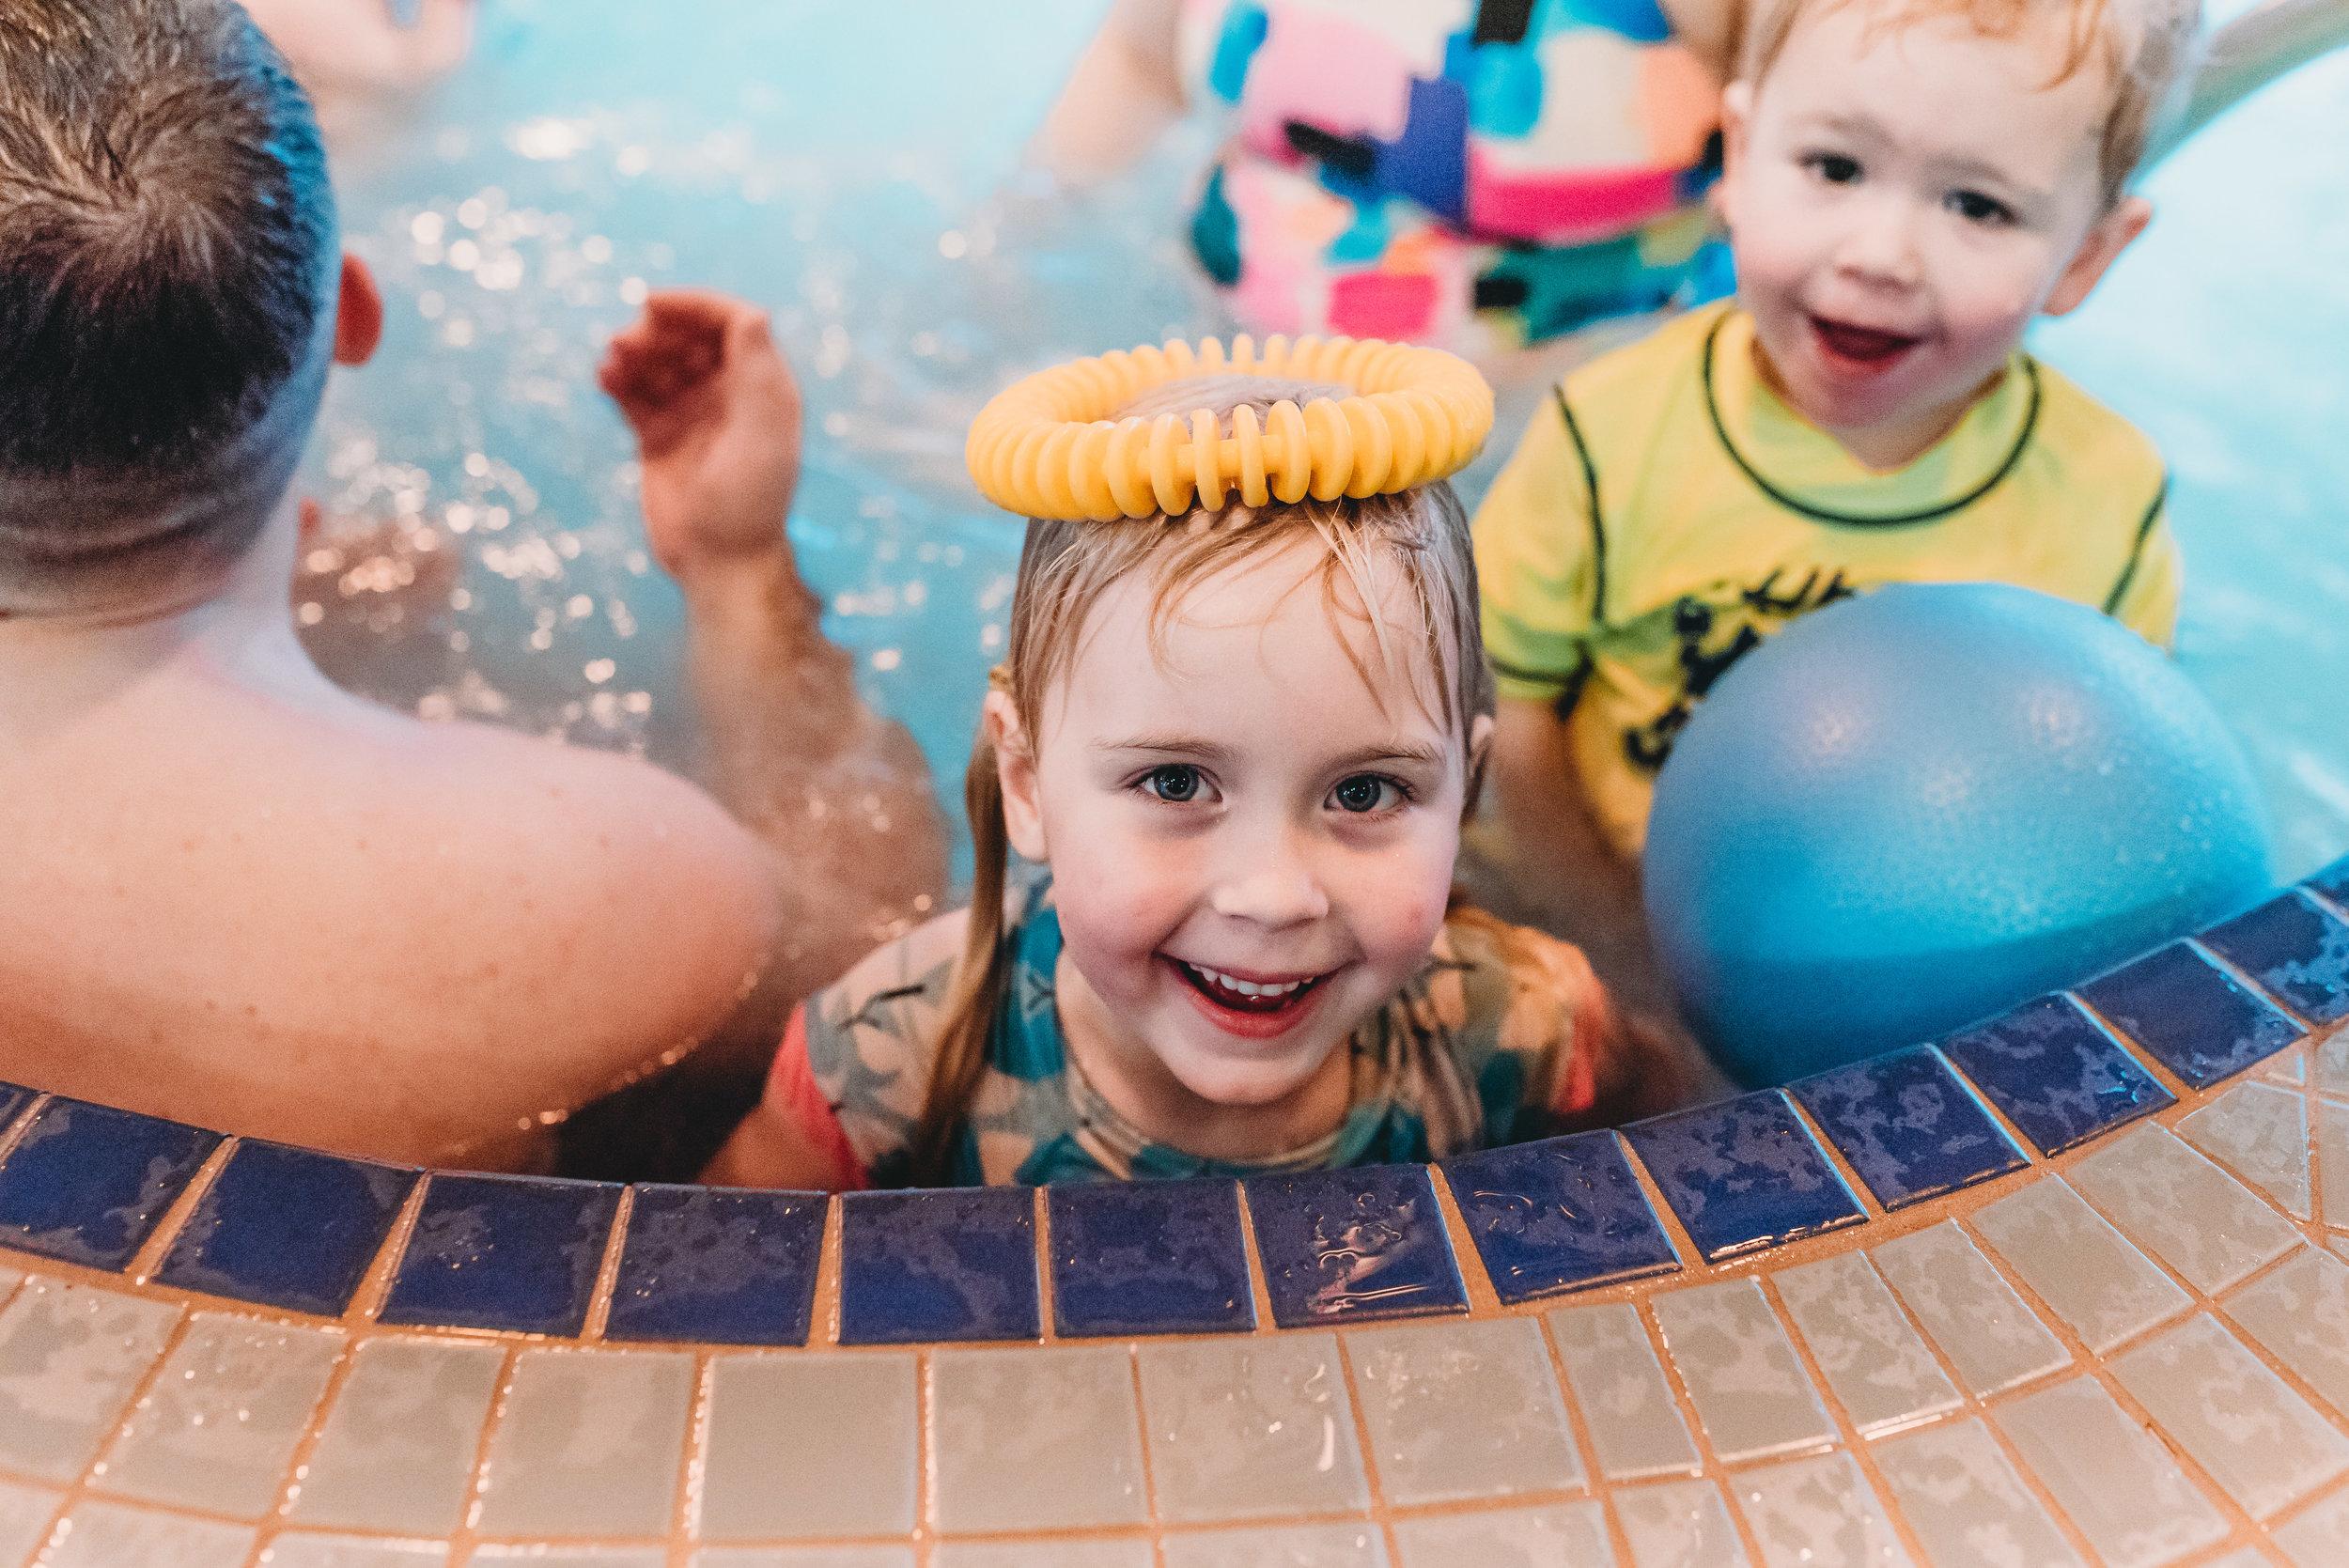 Nicola_Reiersen_Photography_Kids_Birthday_Pool_Party (19).jpg